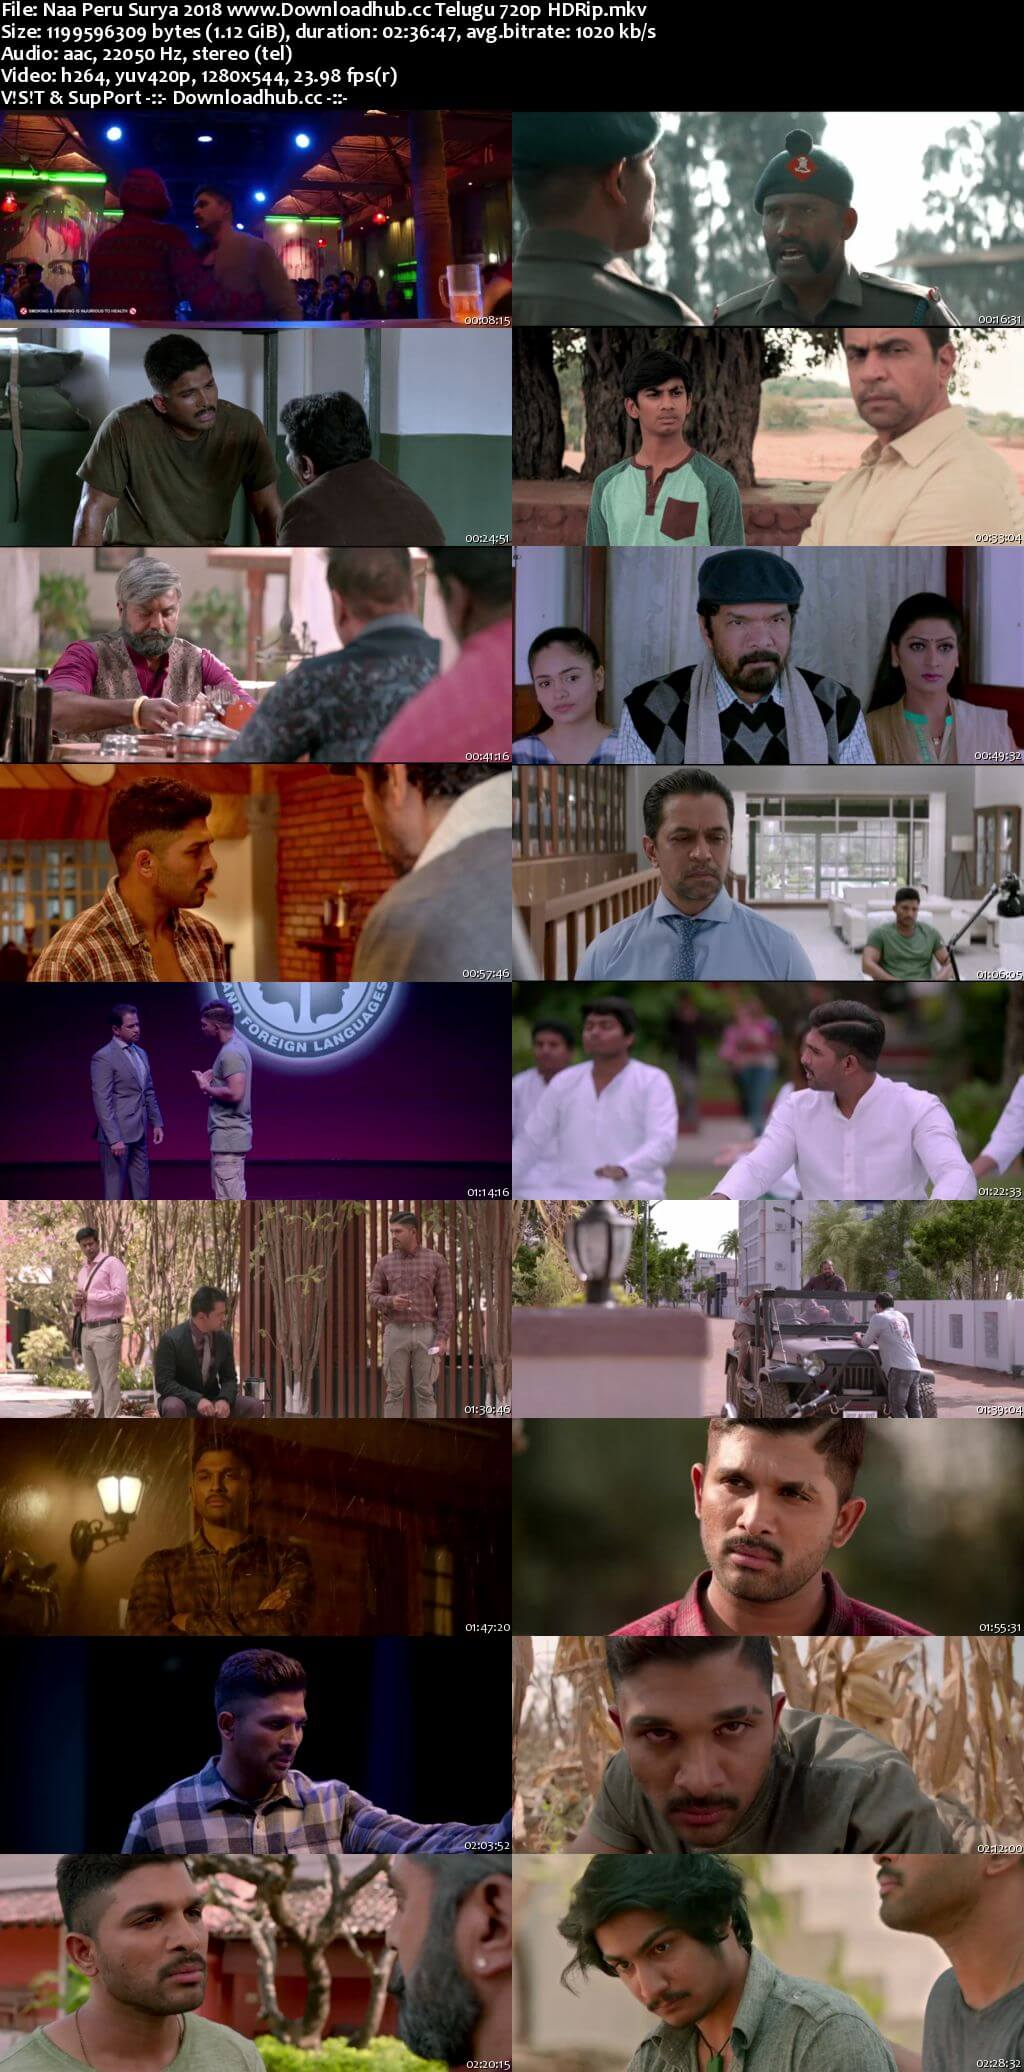 Naa Peru Surya 2018 Telugu 720p HDRip